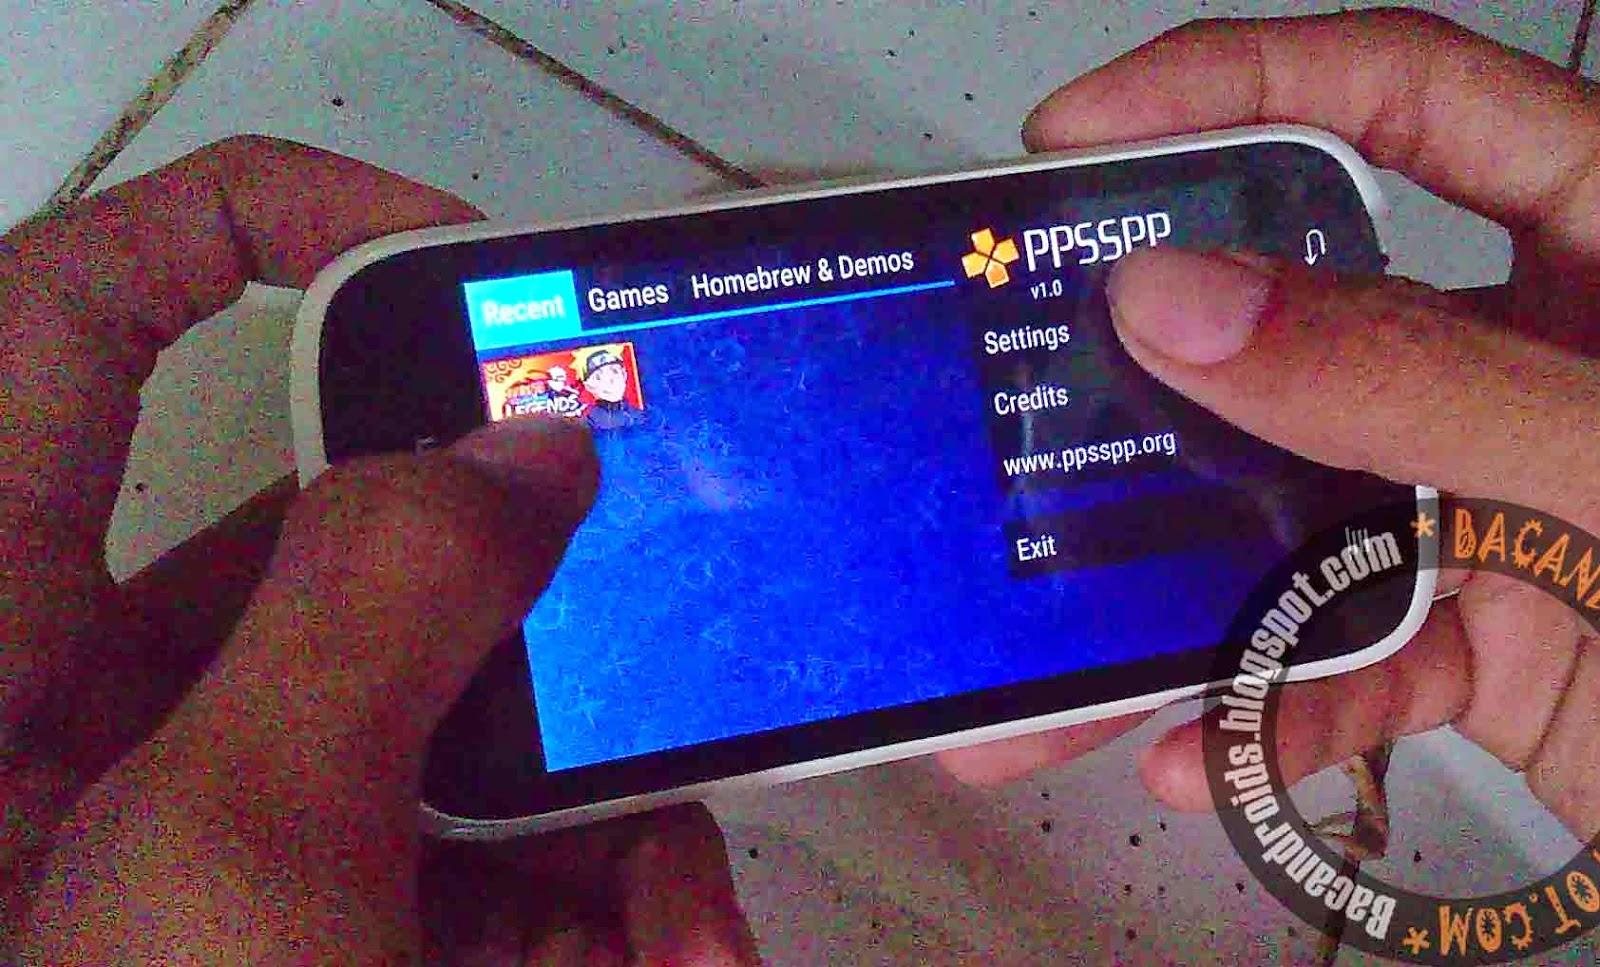 Emulator PPSSPP/PSP Gold Android Apk Versi 1.0 Terbaru